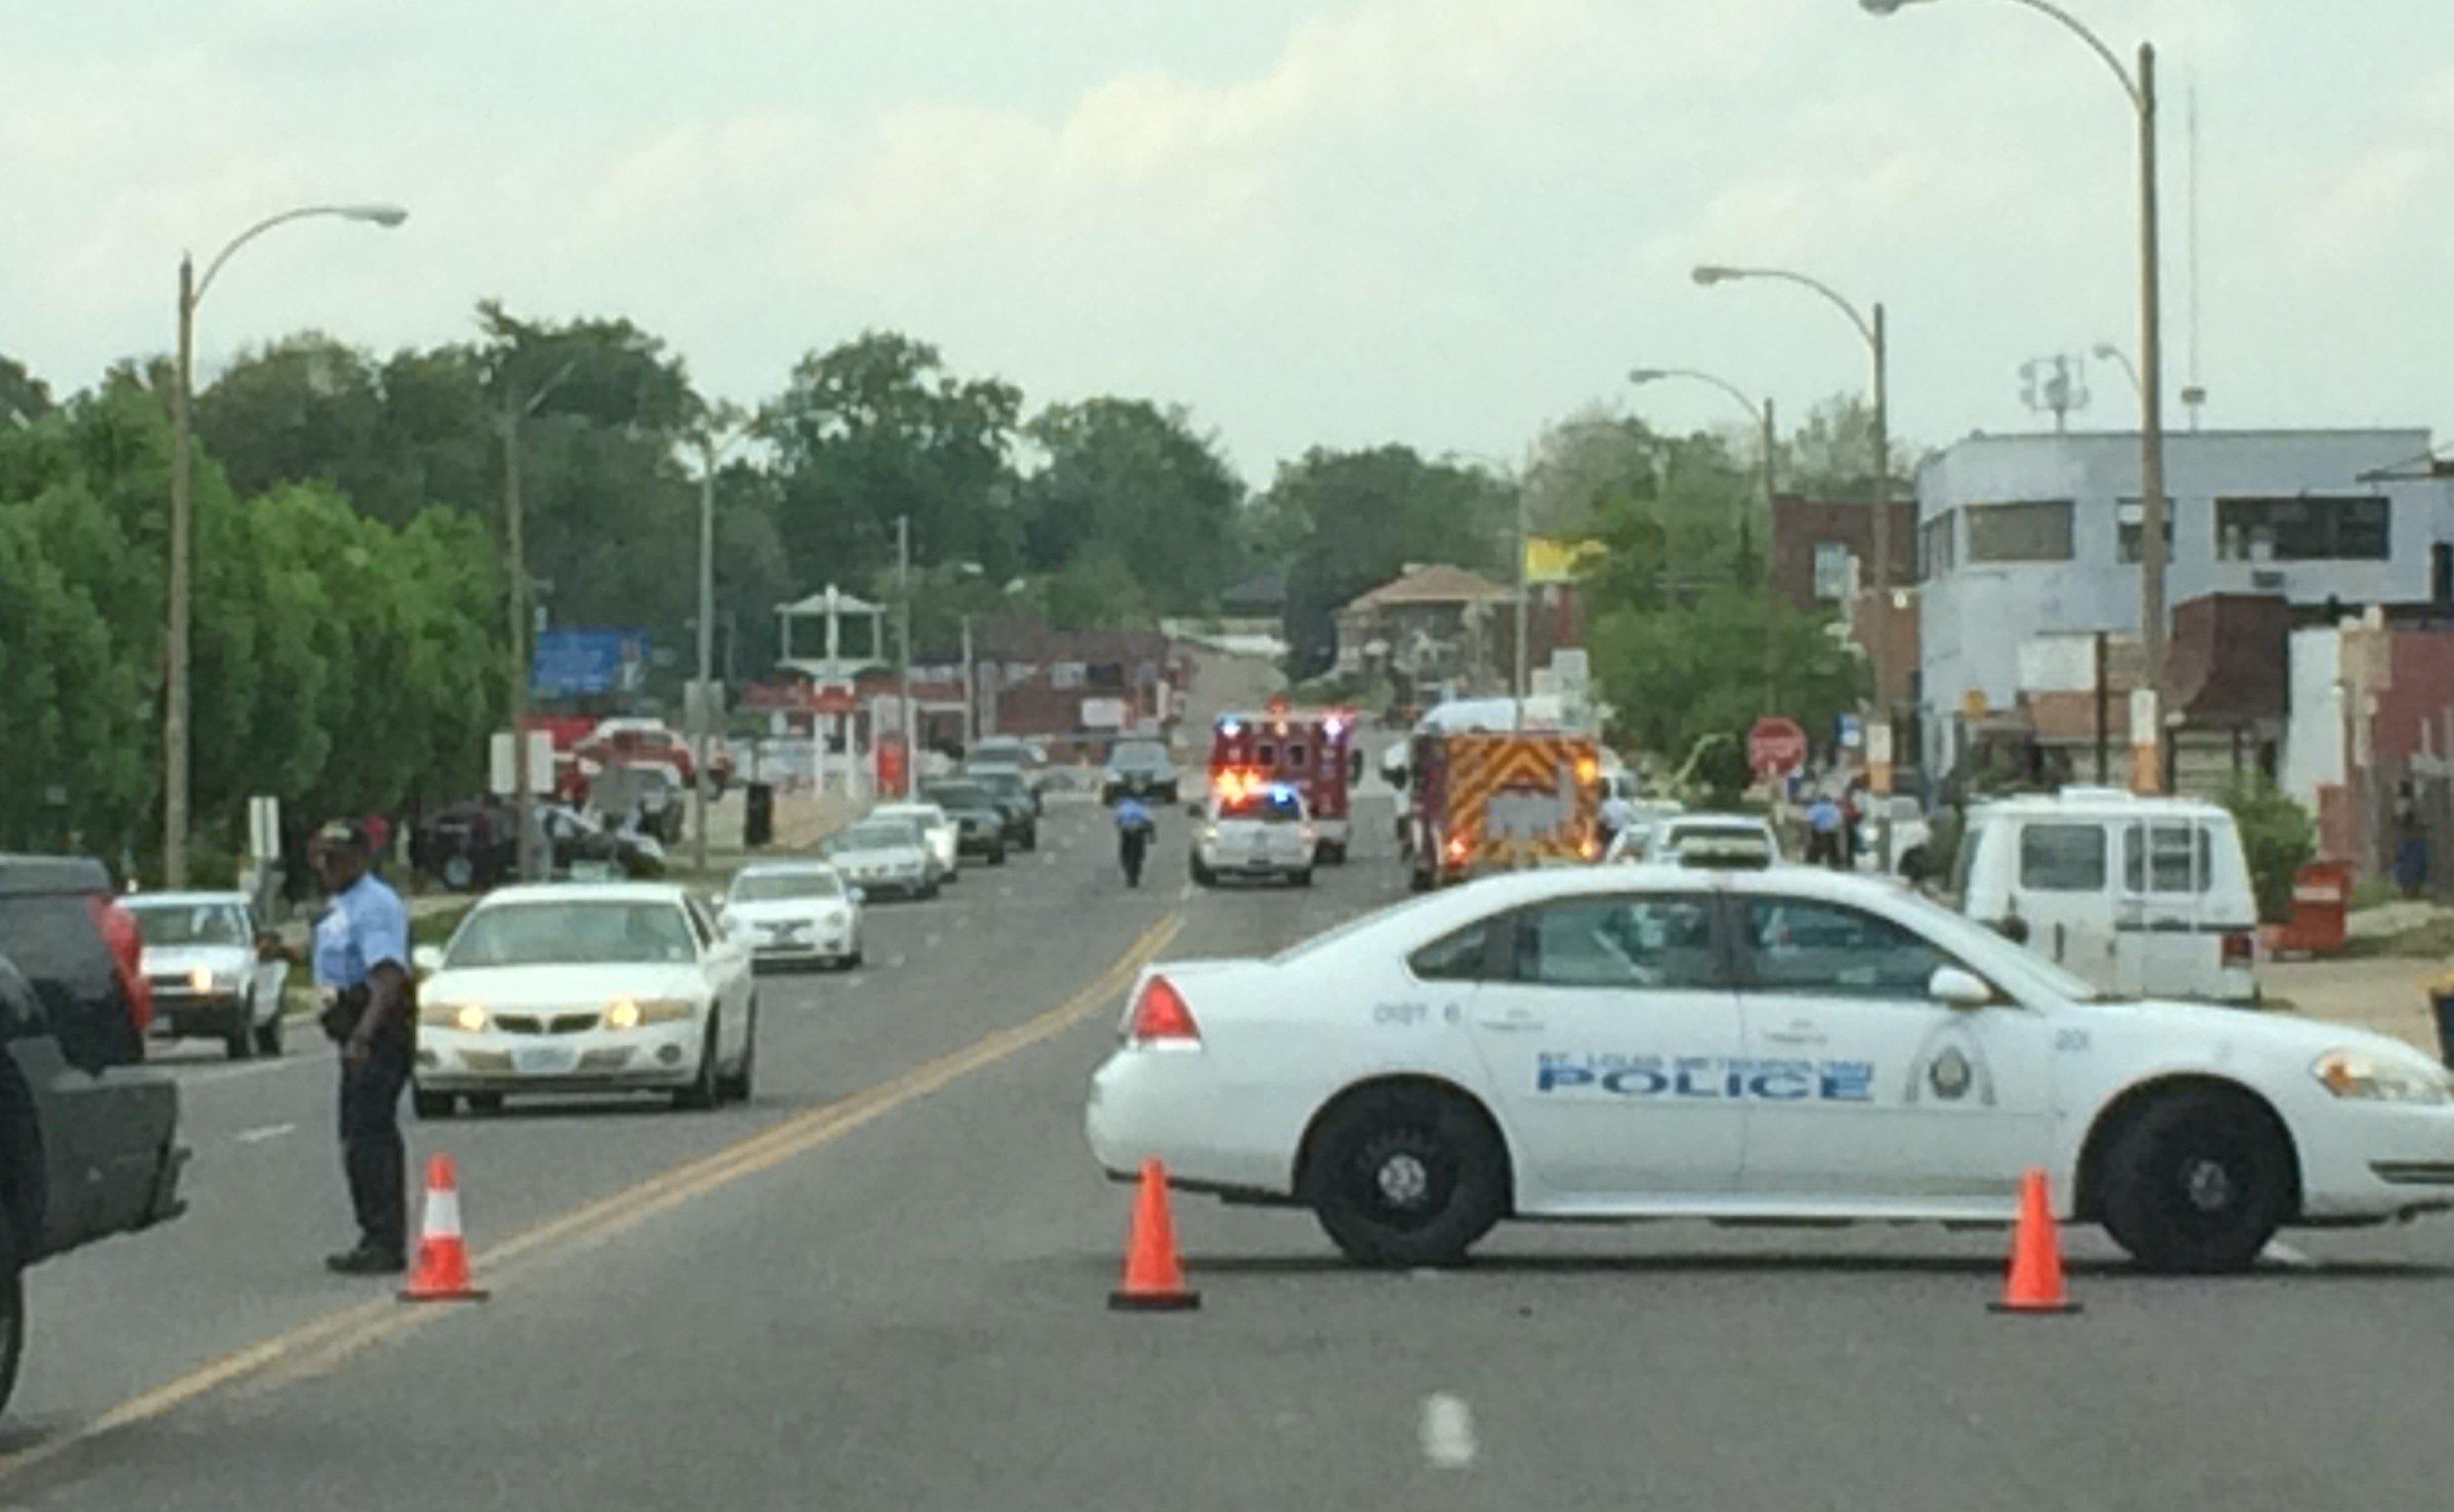 Shooting scene in the 6000 block of Natural Bridge in St. Louis